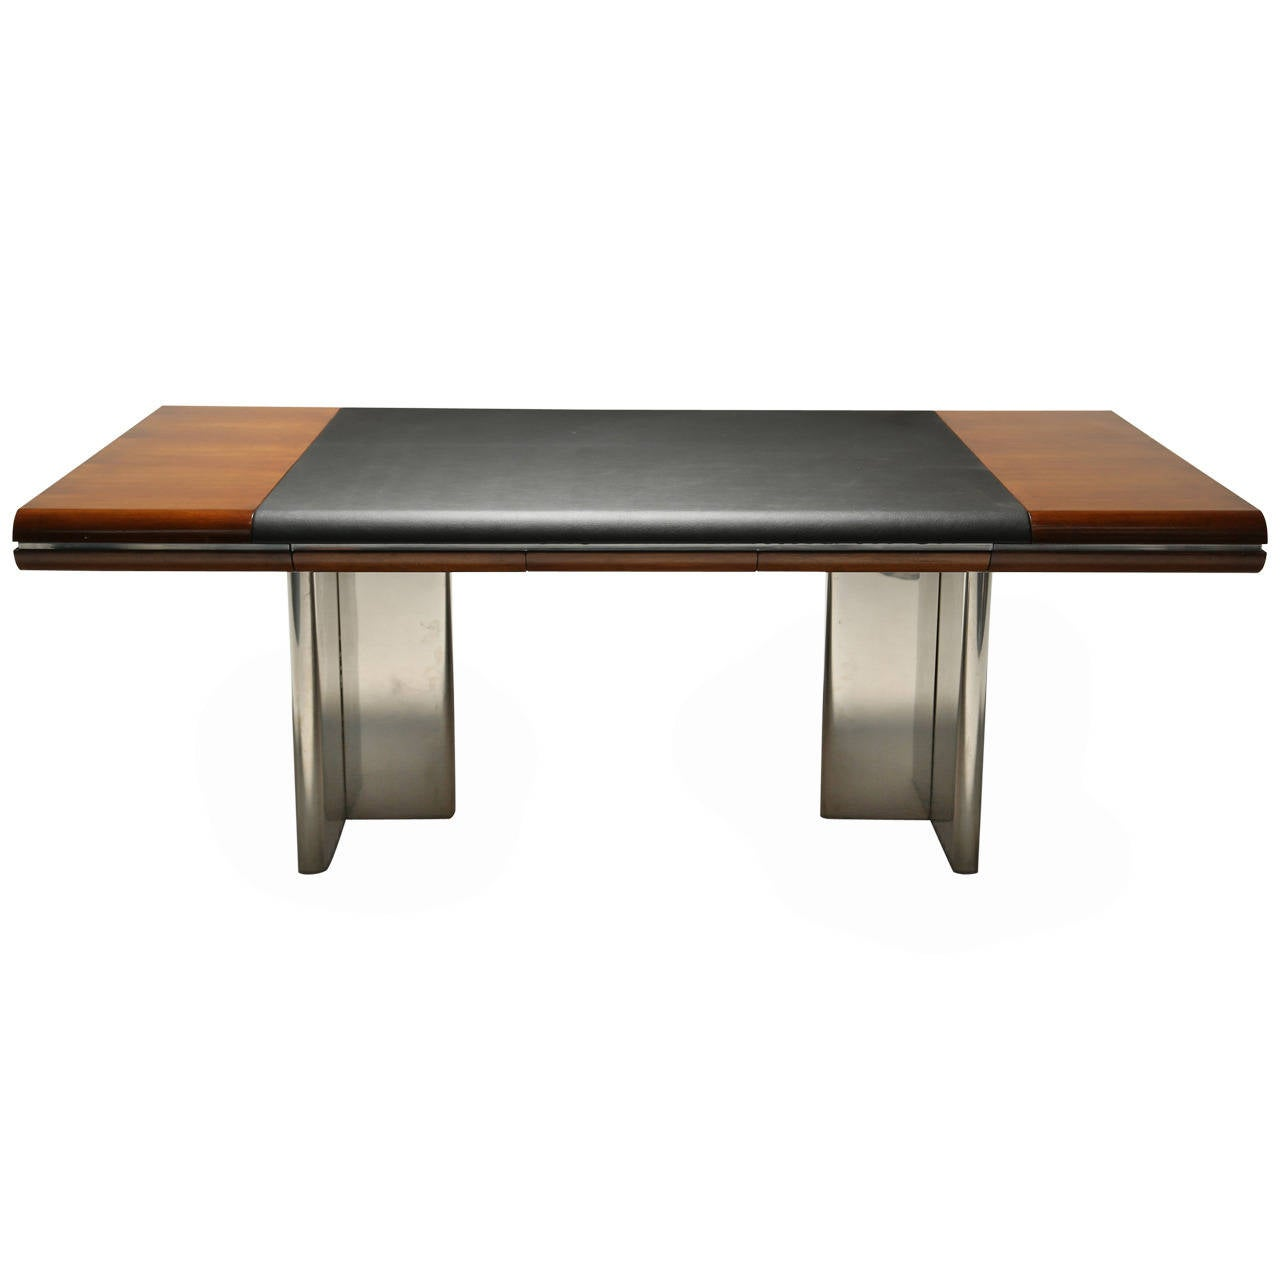 Mahogany hans von klier vintage executive desk at 1stdibs